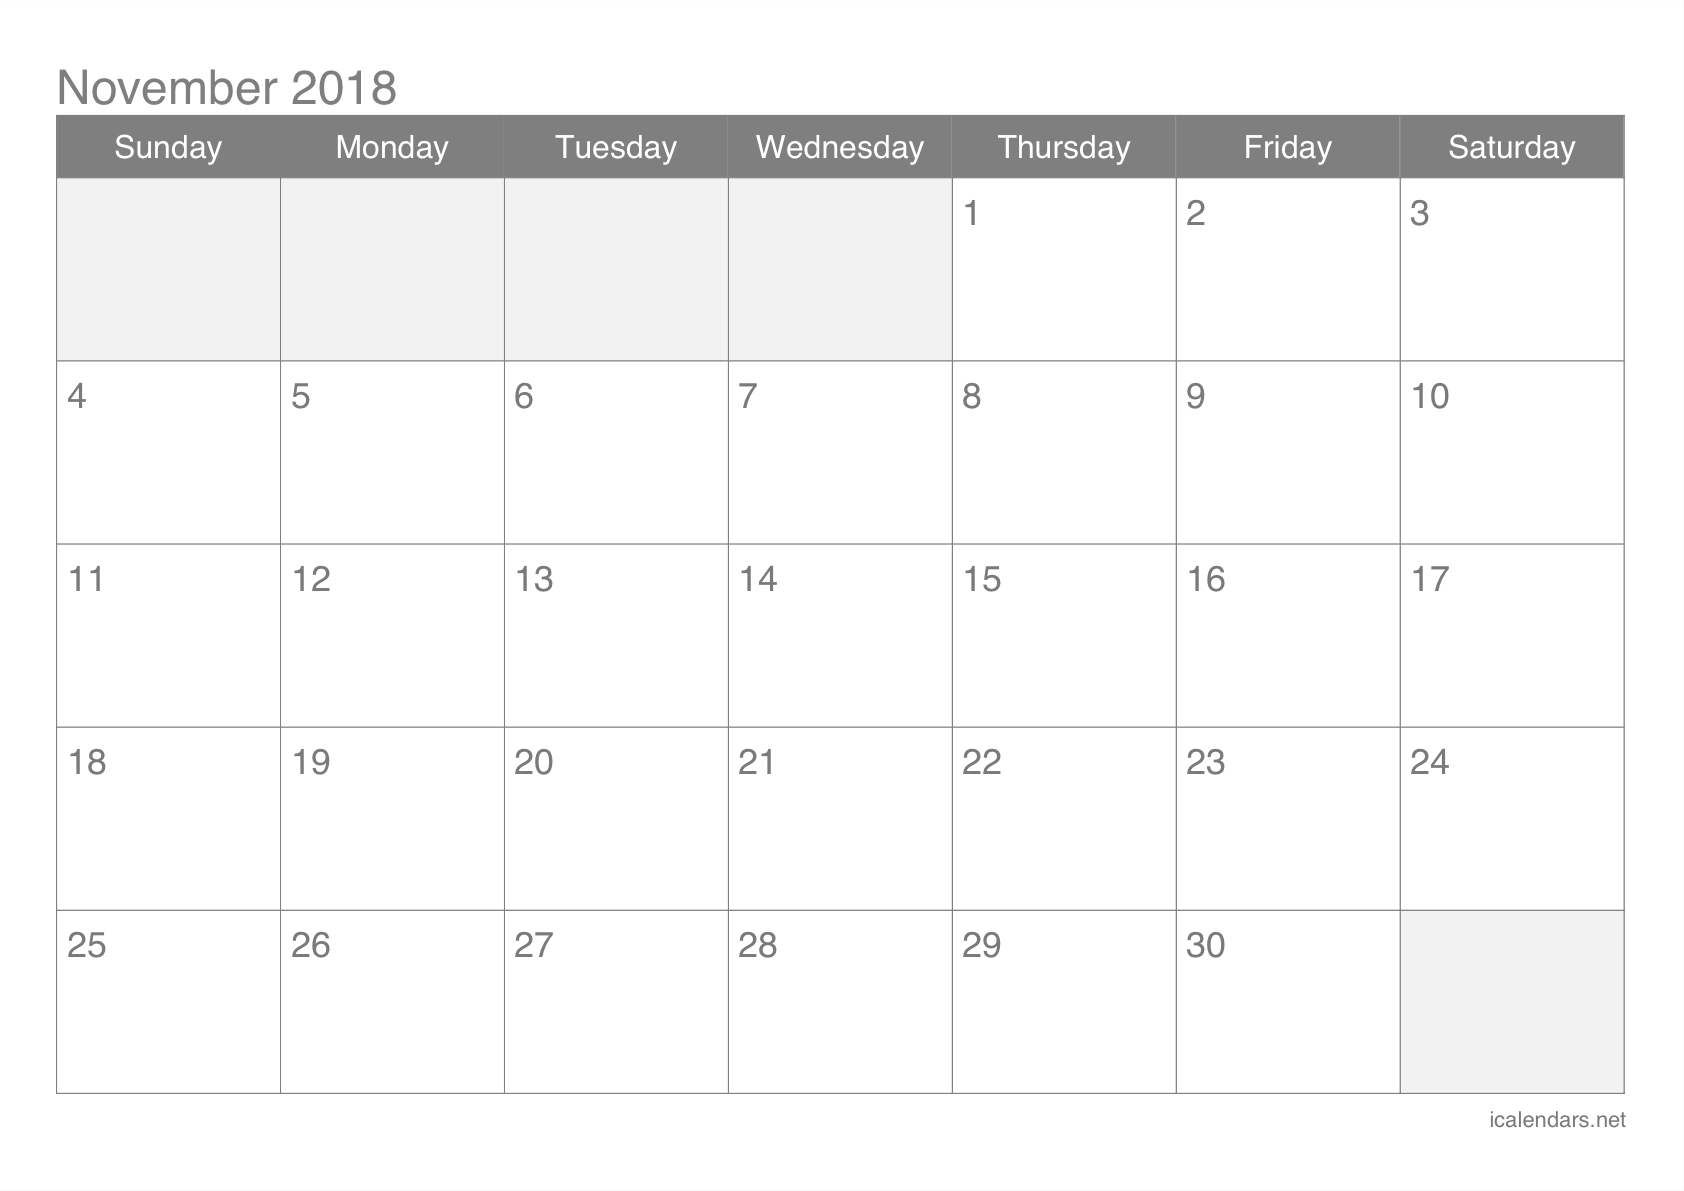 Blank Calendar Nov 18